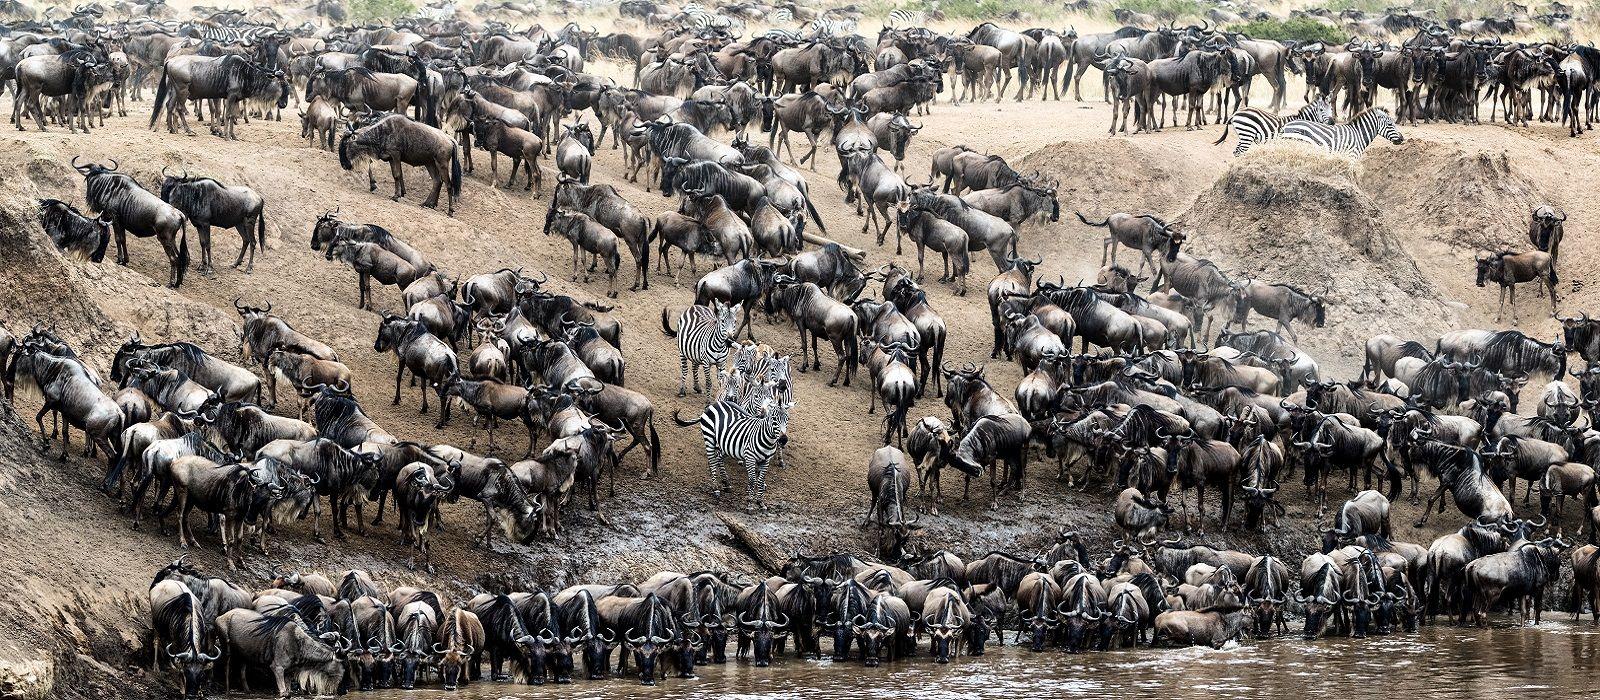 Atua Enkop Exclusive: Kenya Safari and Beach Break Tour Trip 4